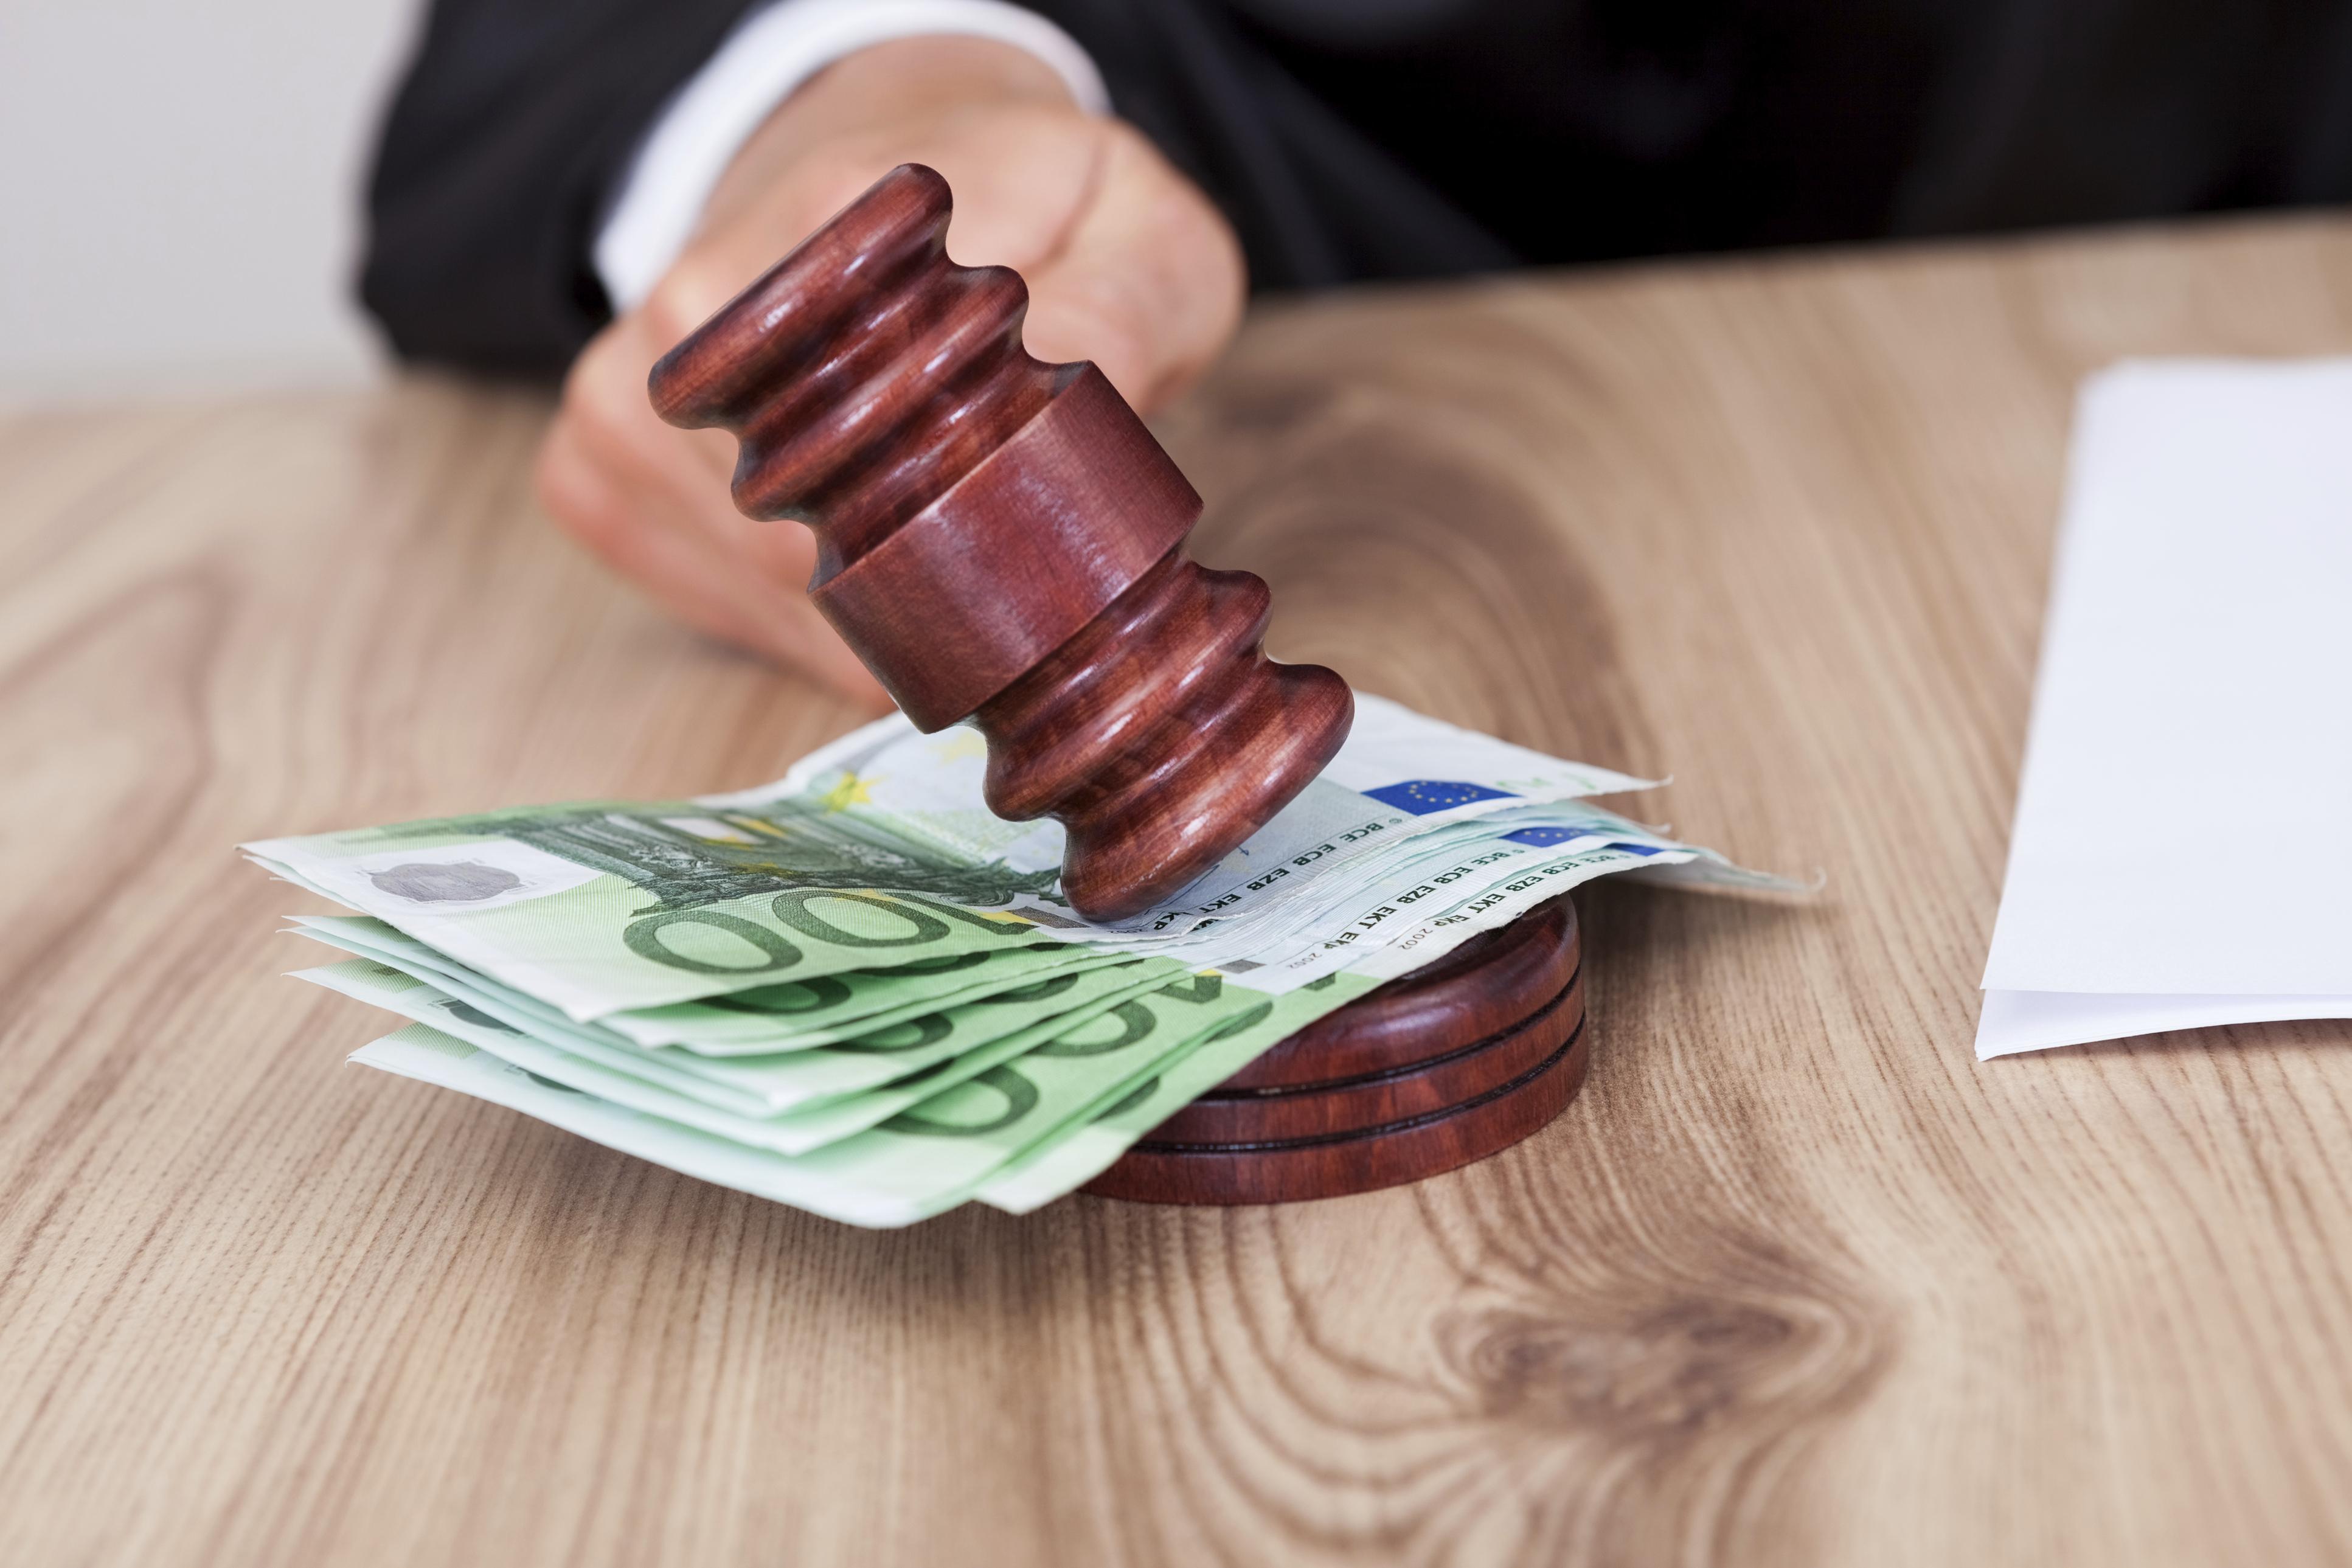 http://www.gestiun.com/wp-content/uploads/2014/04/tasas-judiciales1.jpg